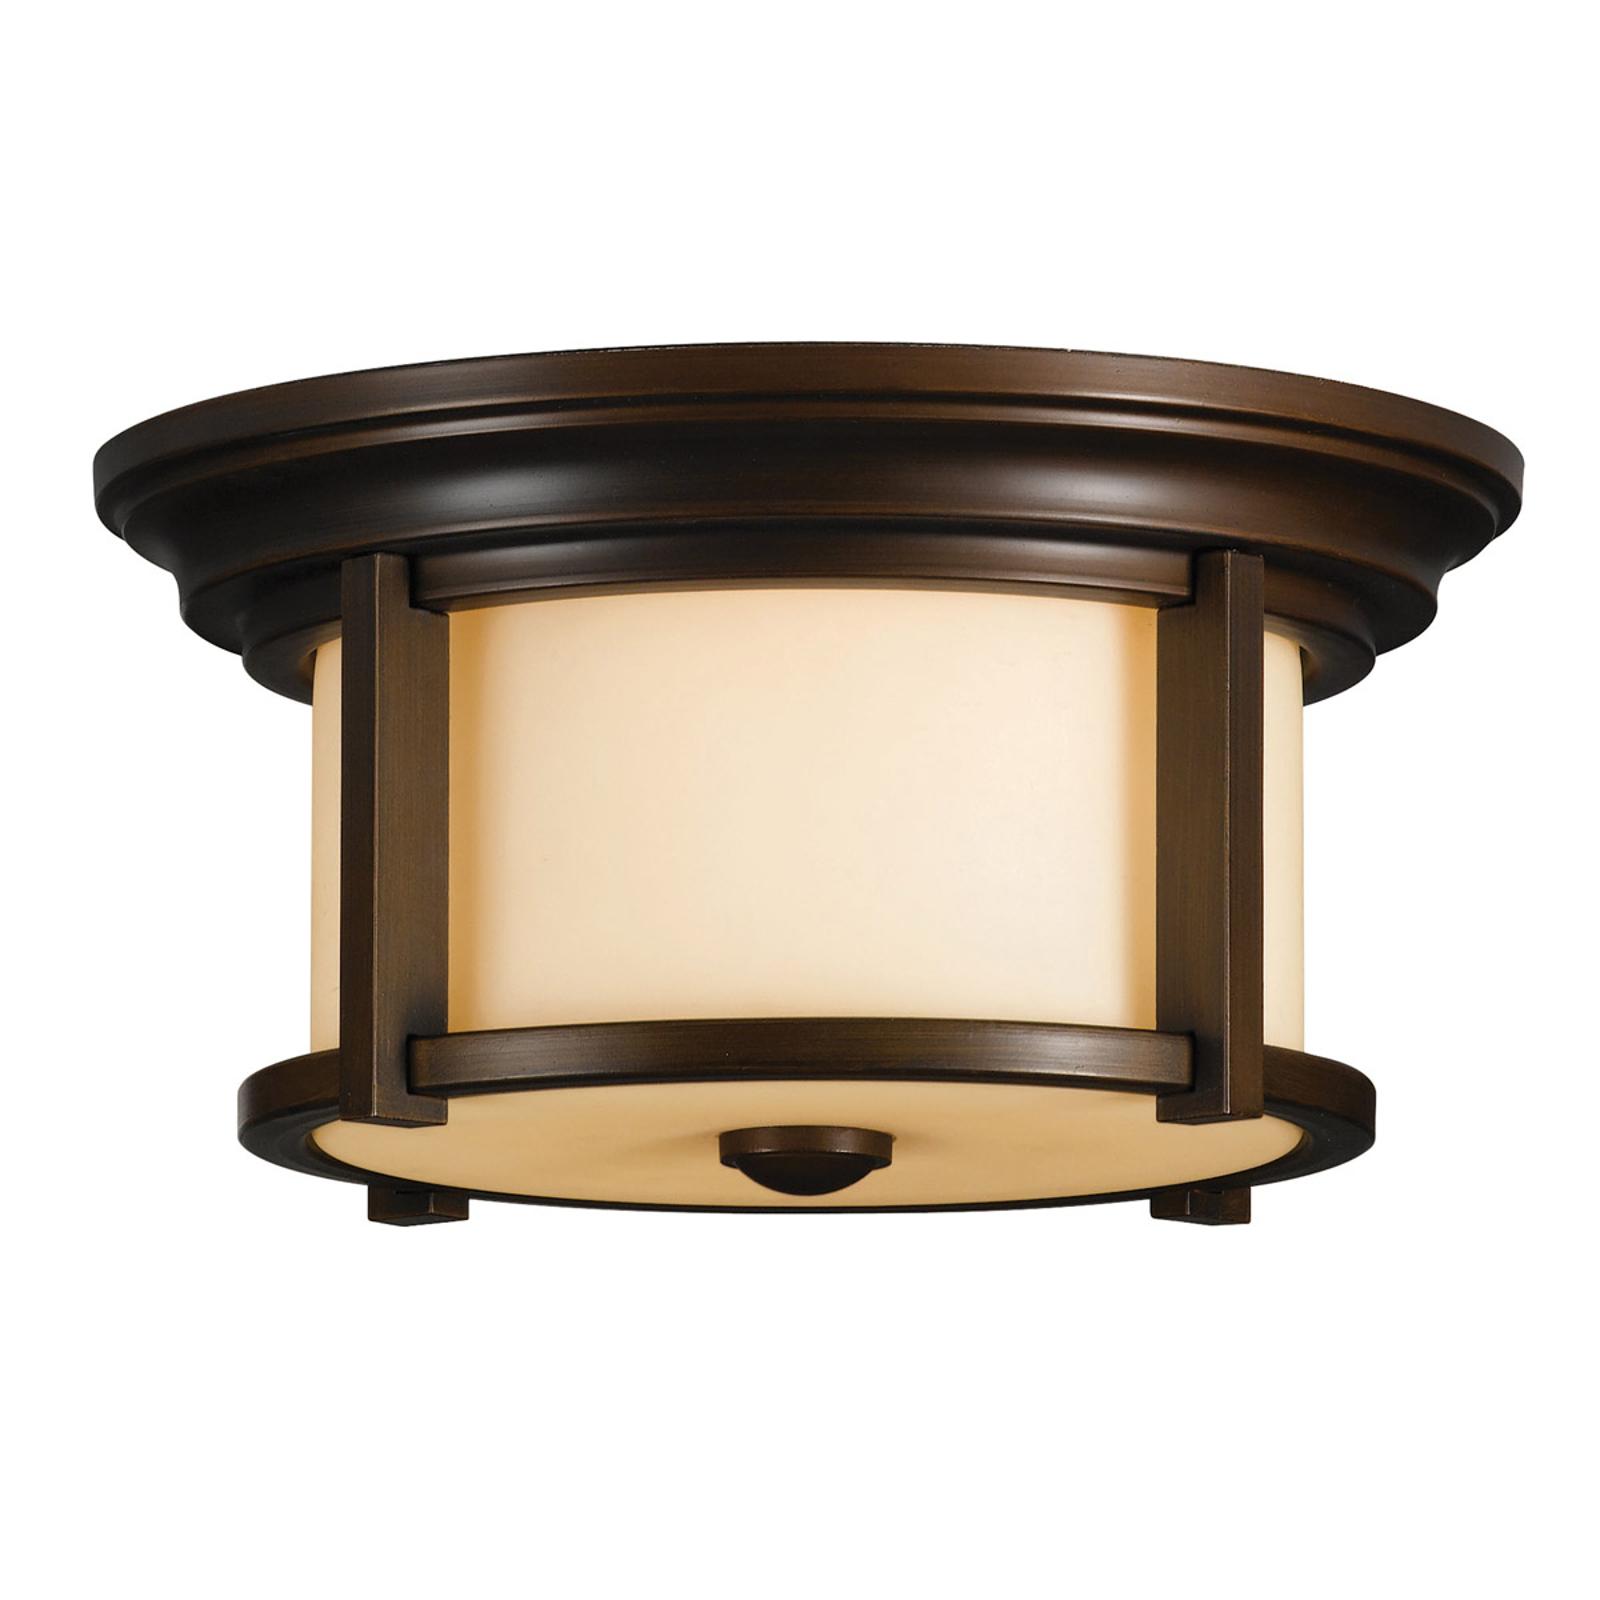 Merrill udendørs loftslampe, bronze